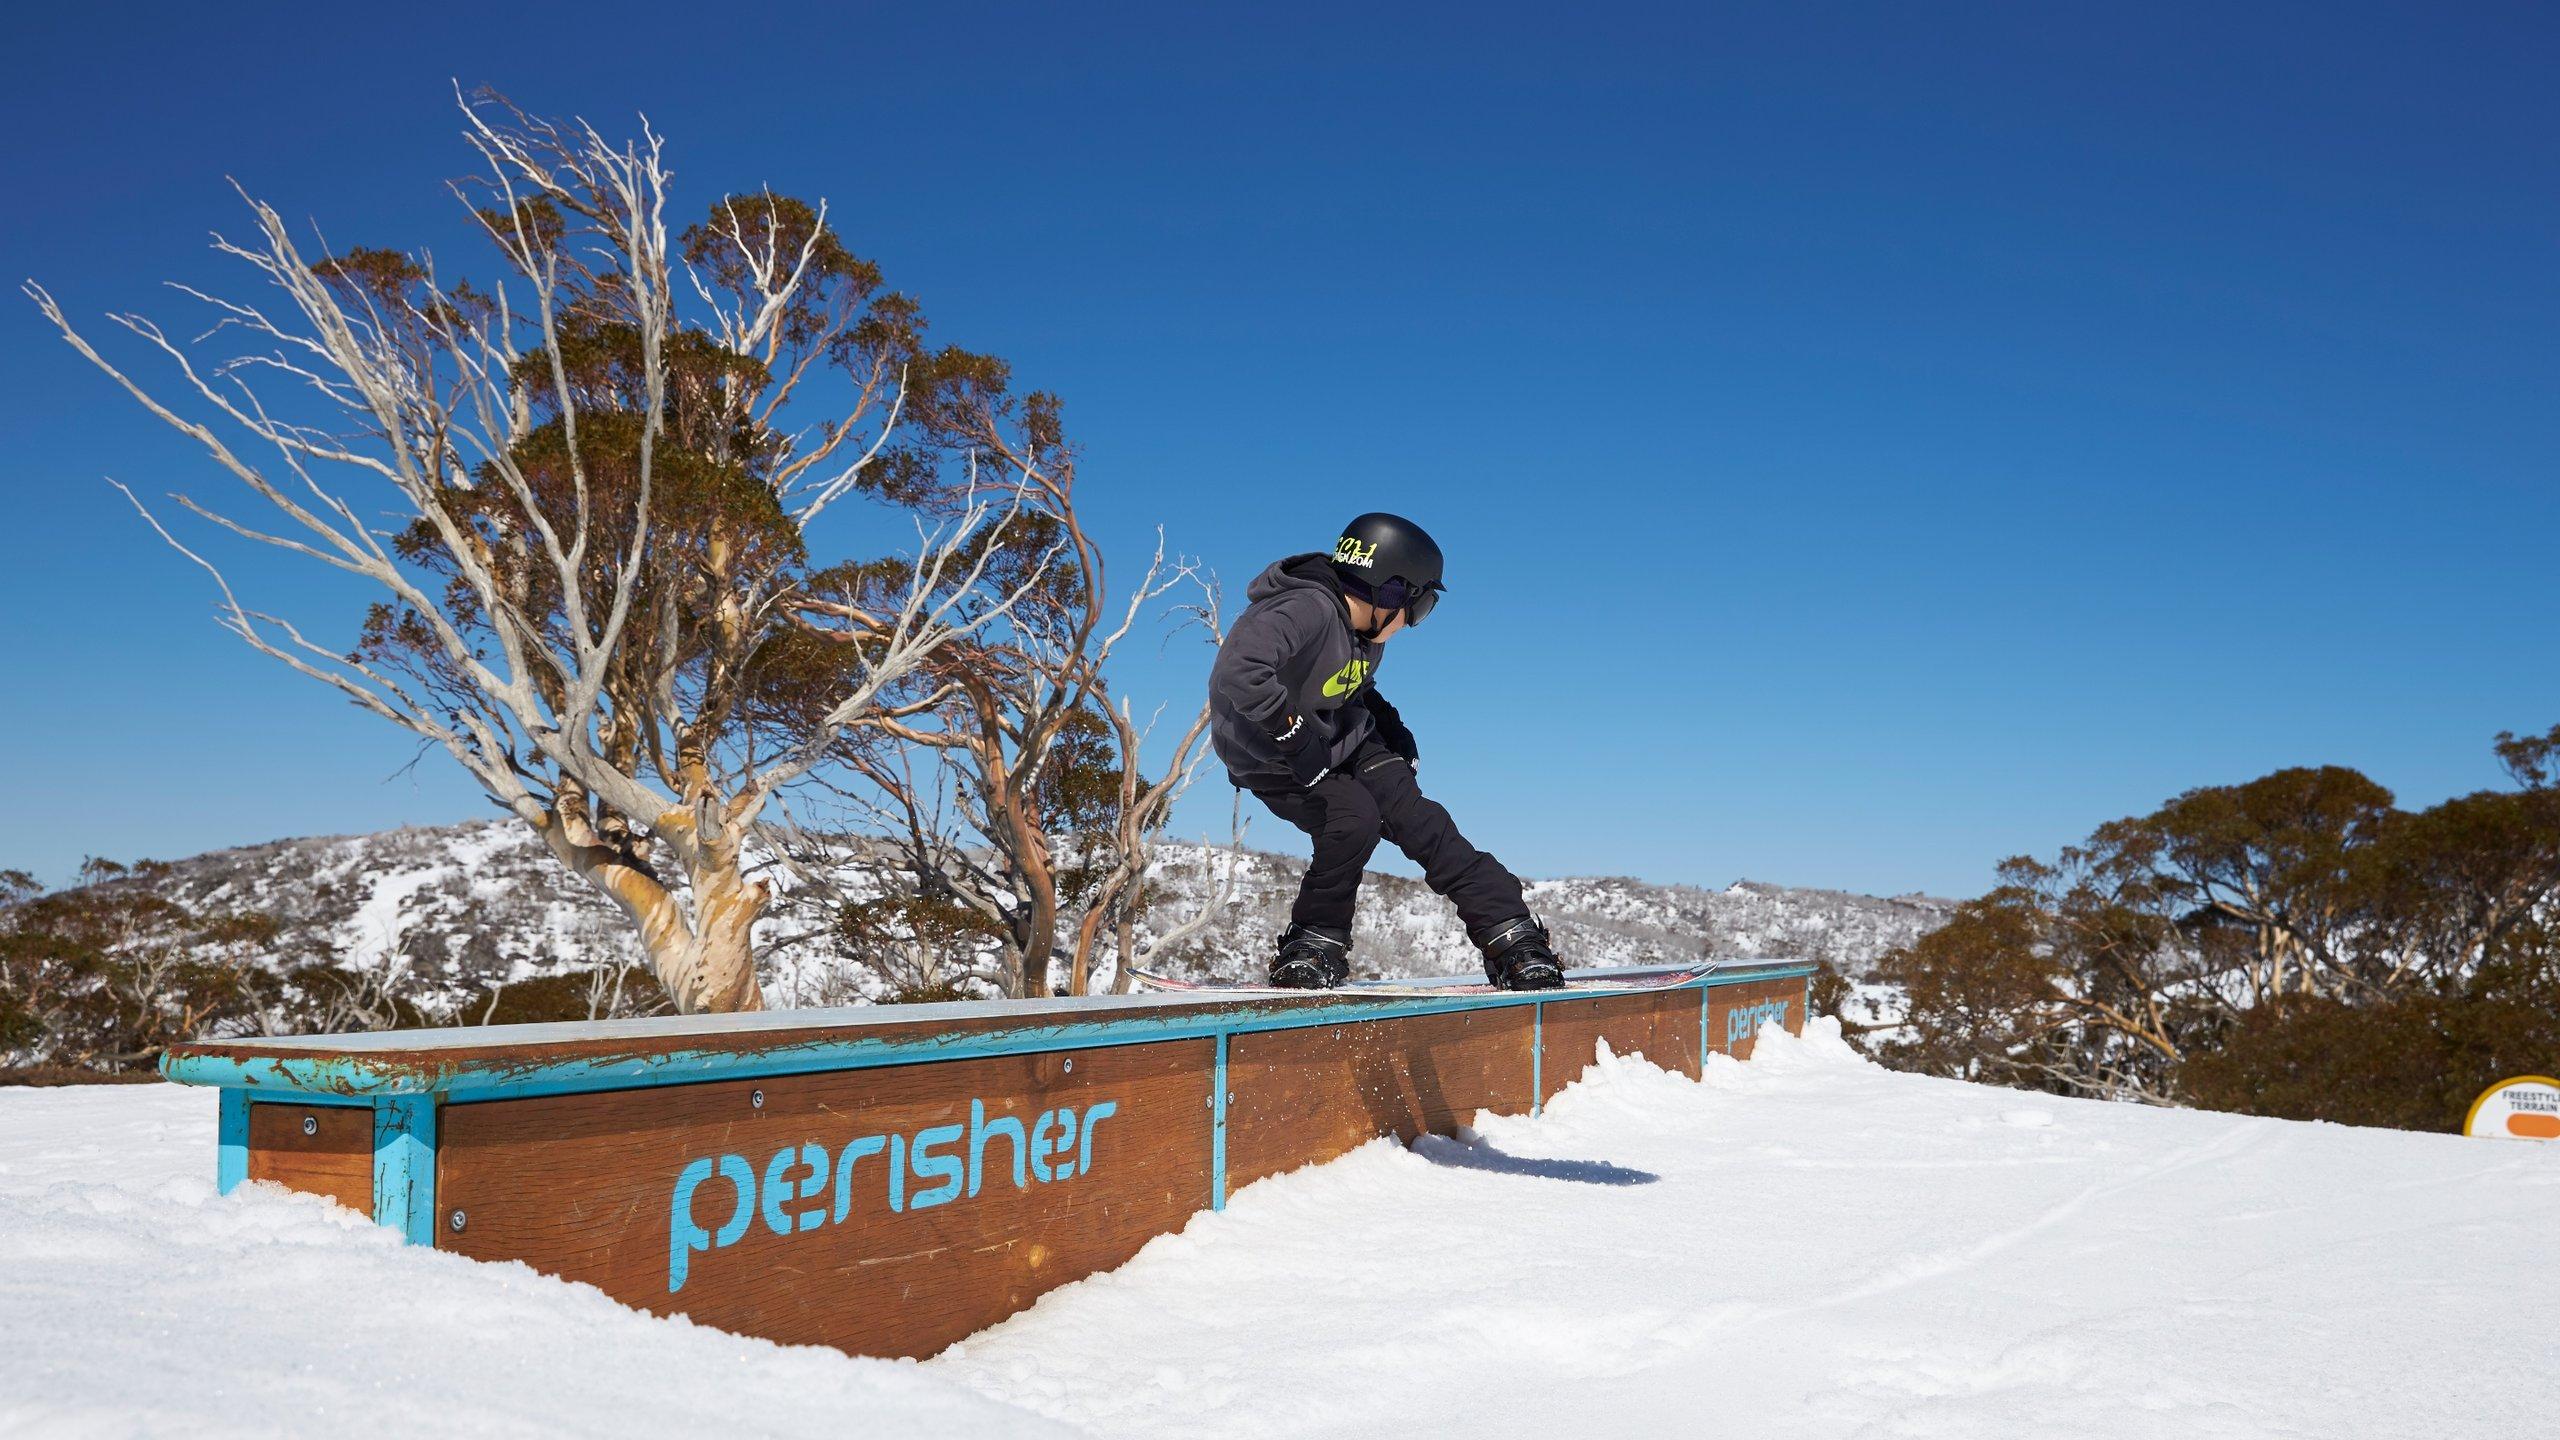 Perisher Ski Resort, Perisher Valley, New South Wales, Australia